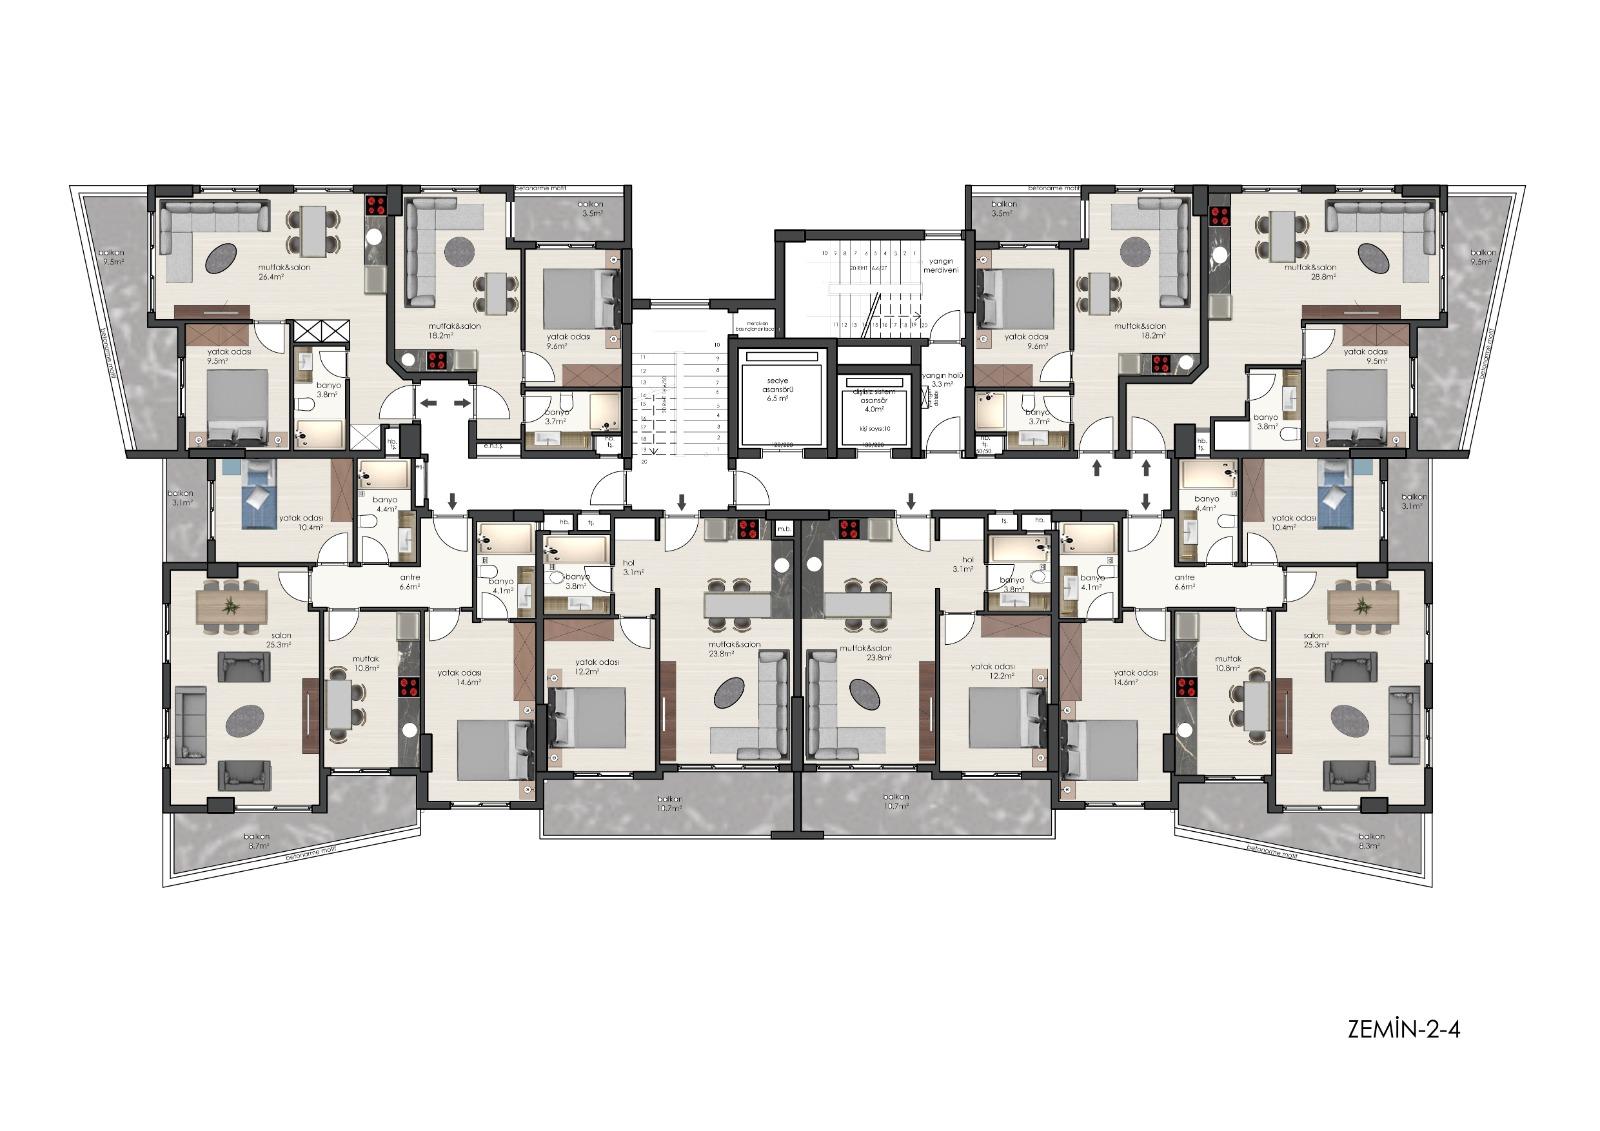 Plan 0, 2, 4 -th floor